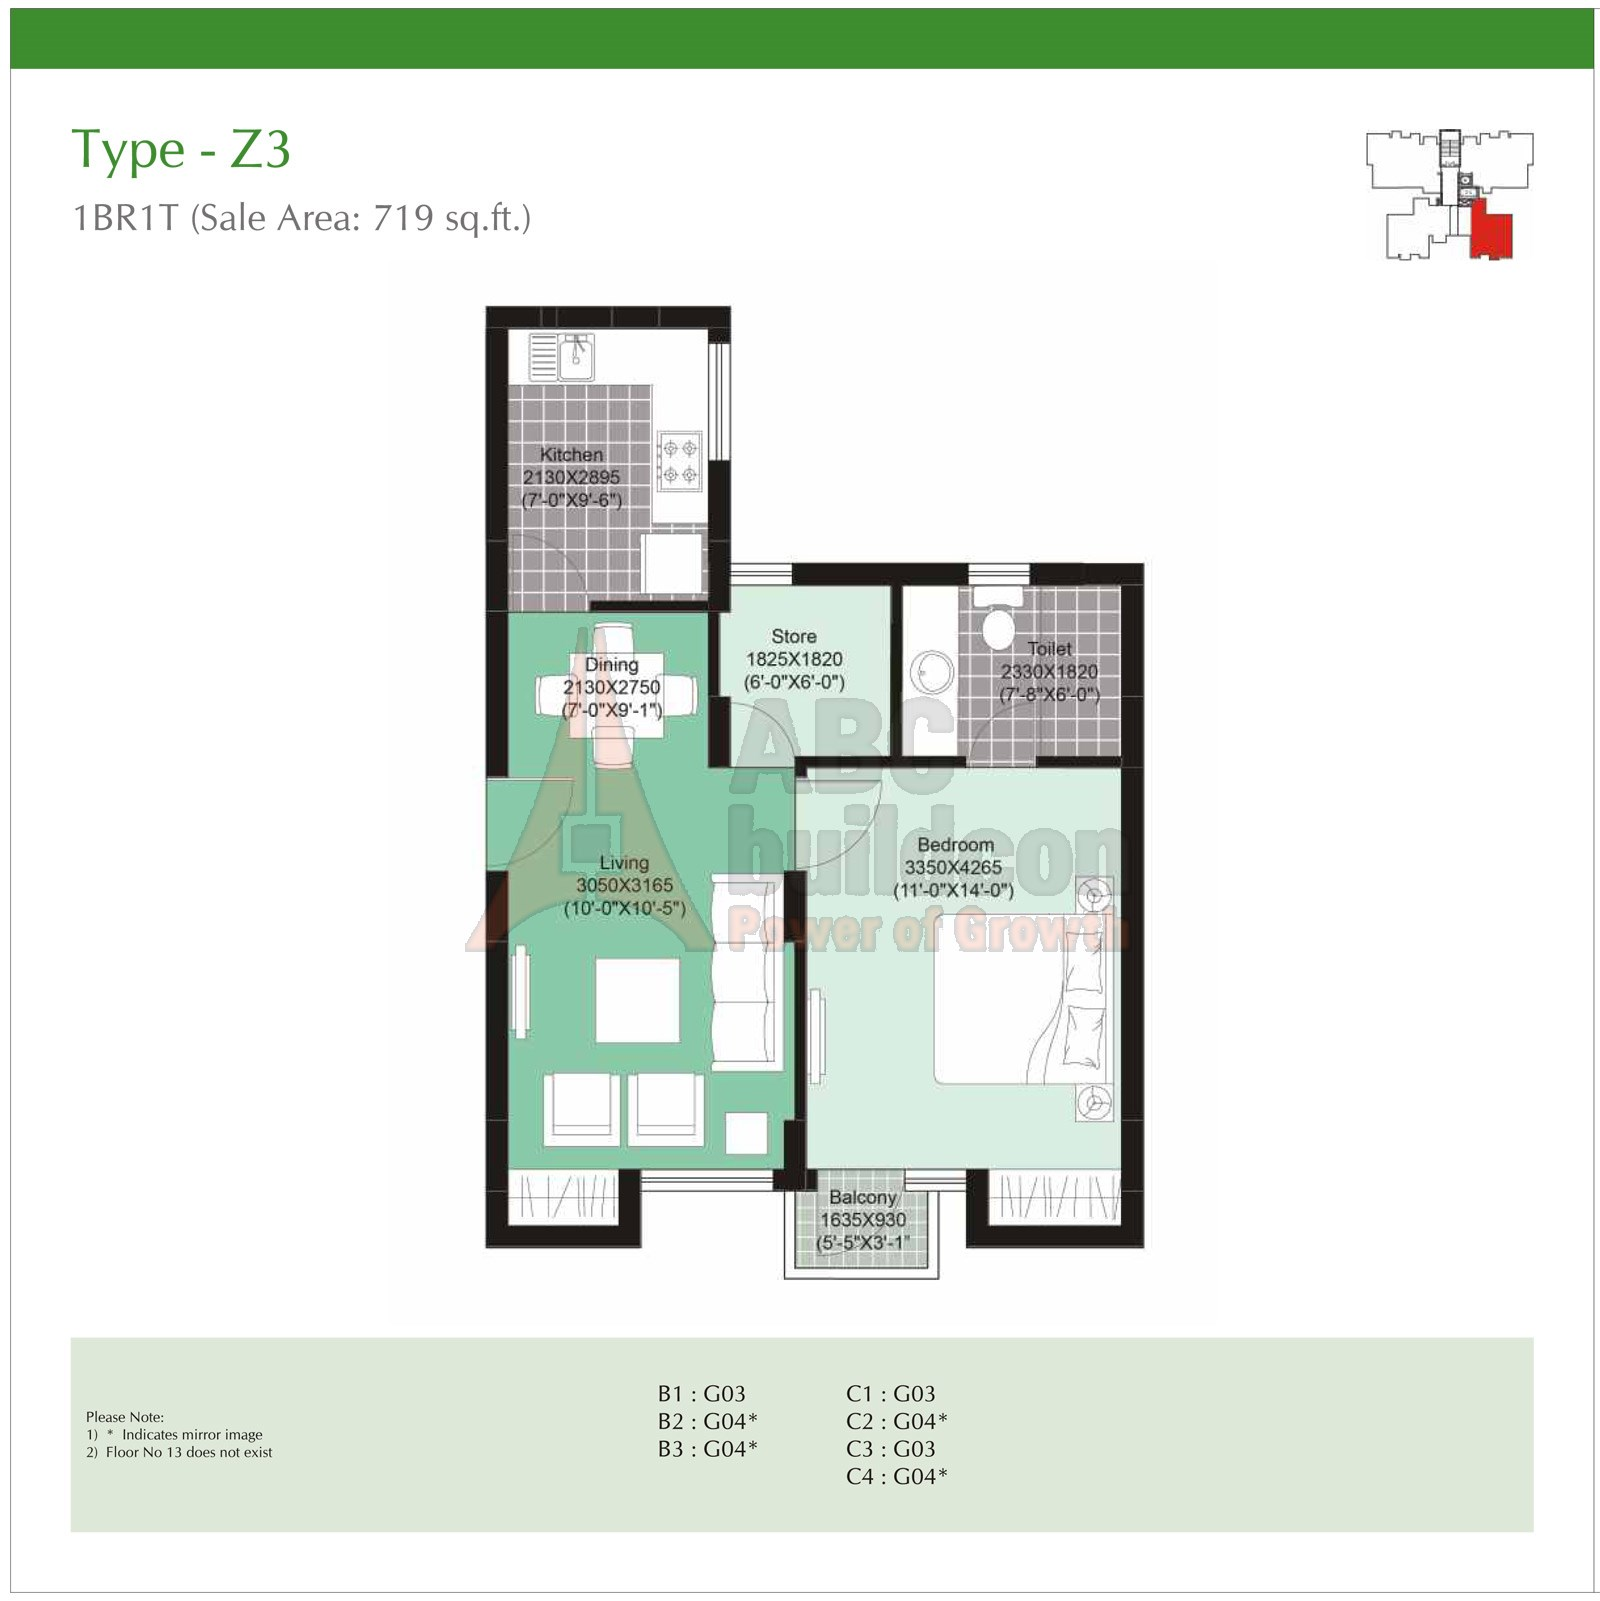 Unitech uniworld gardens 2 floor plan for 1 bhk floor plan